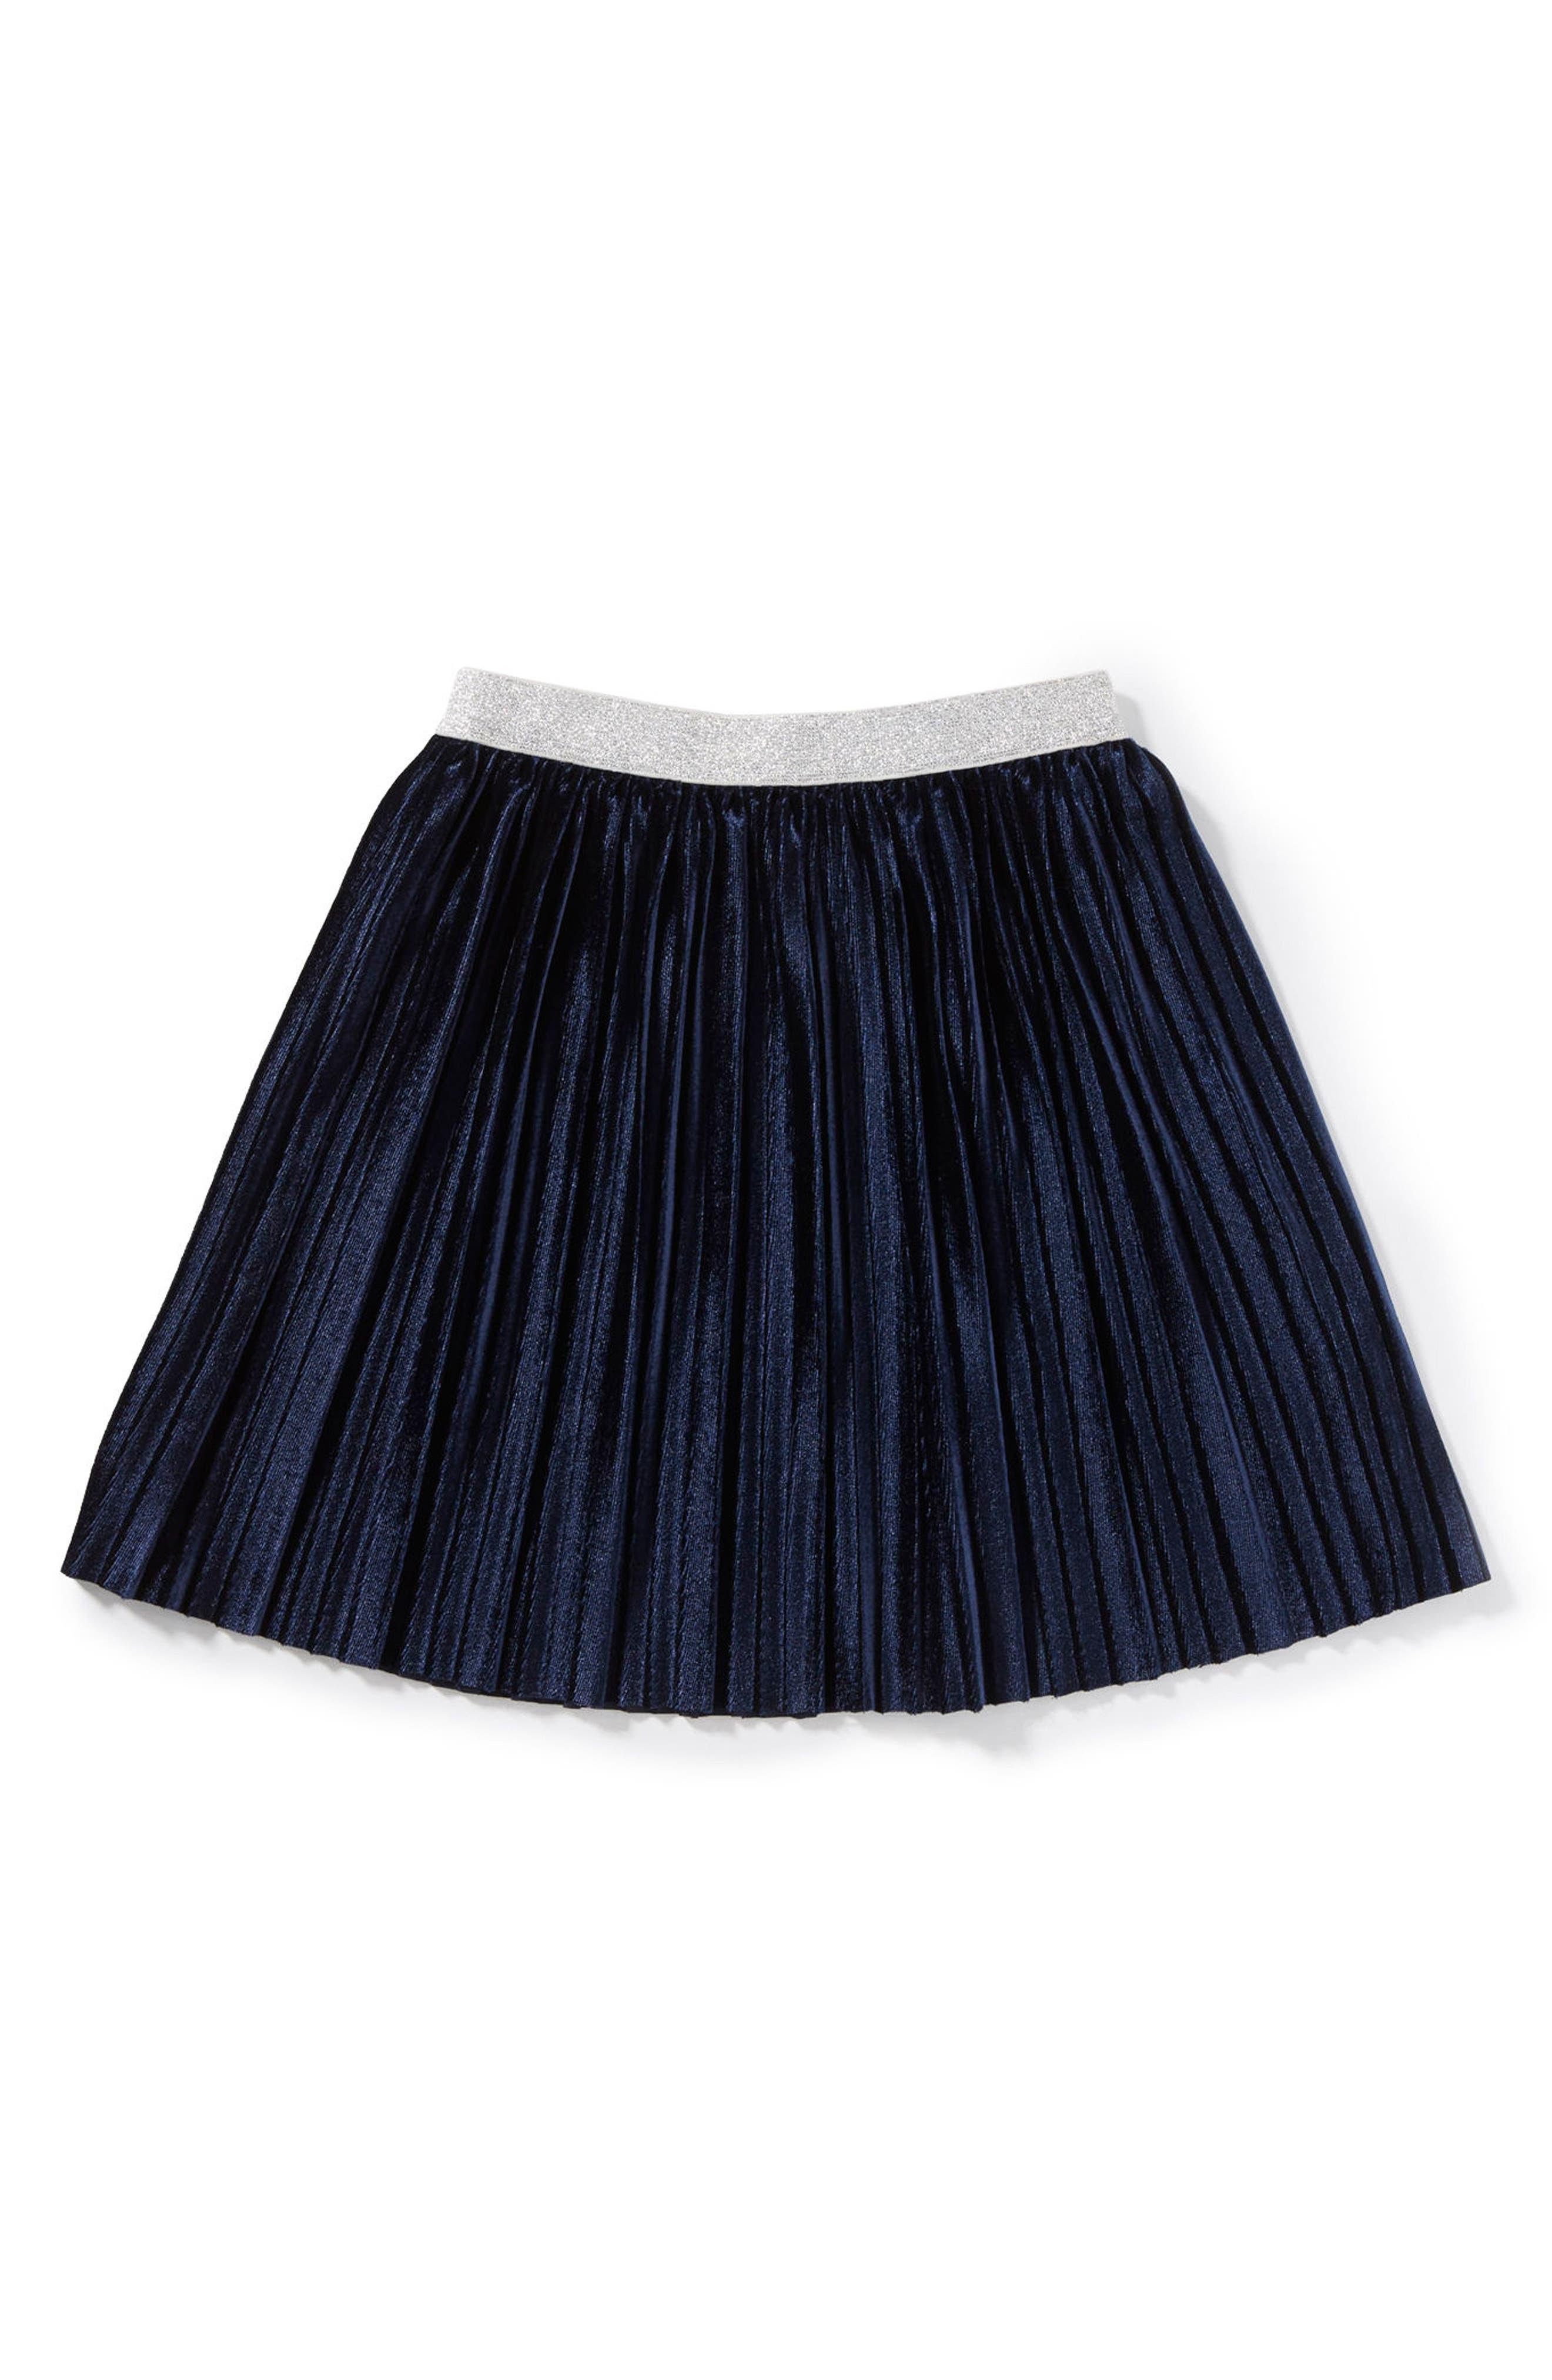 Marissa Pleated Skirt,                         Main,                         color, 410